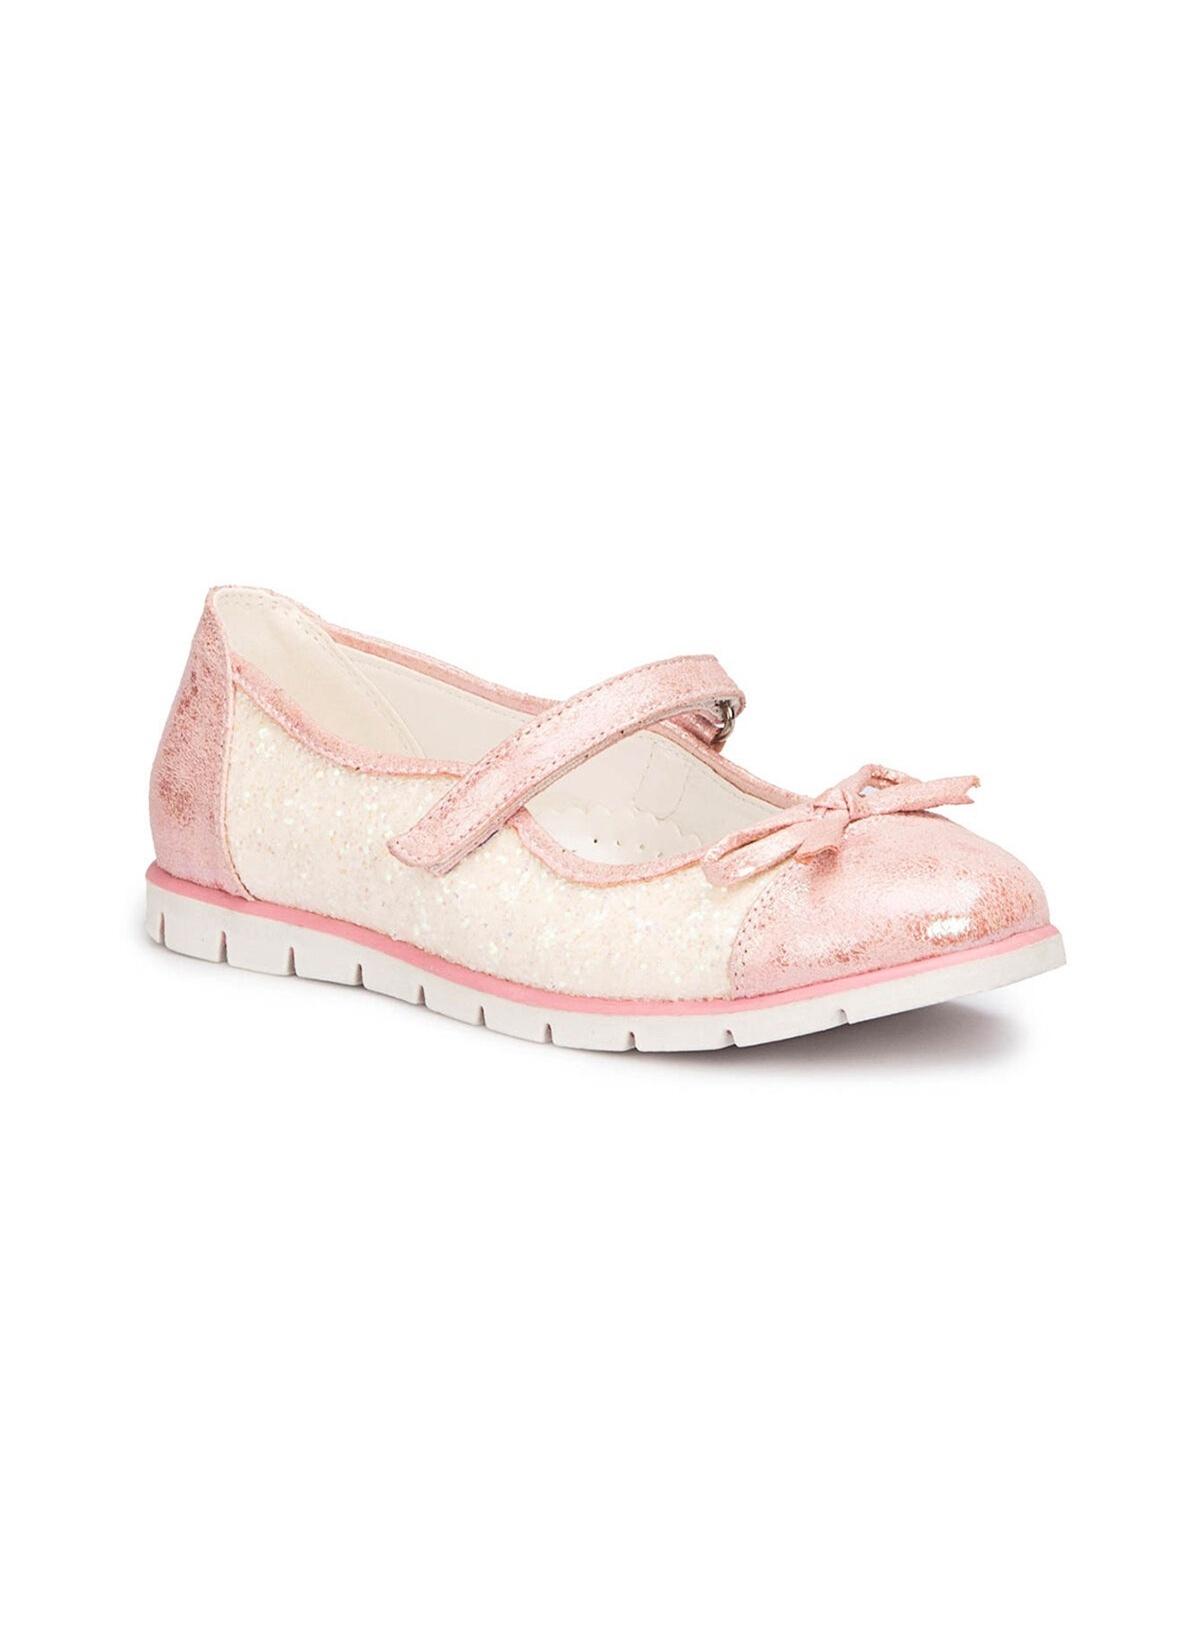 Polaris Ayakkabı 71.509263.f Basic – 59.99 TL